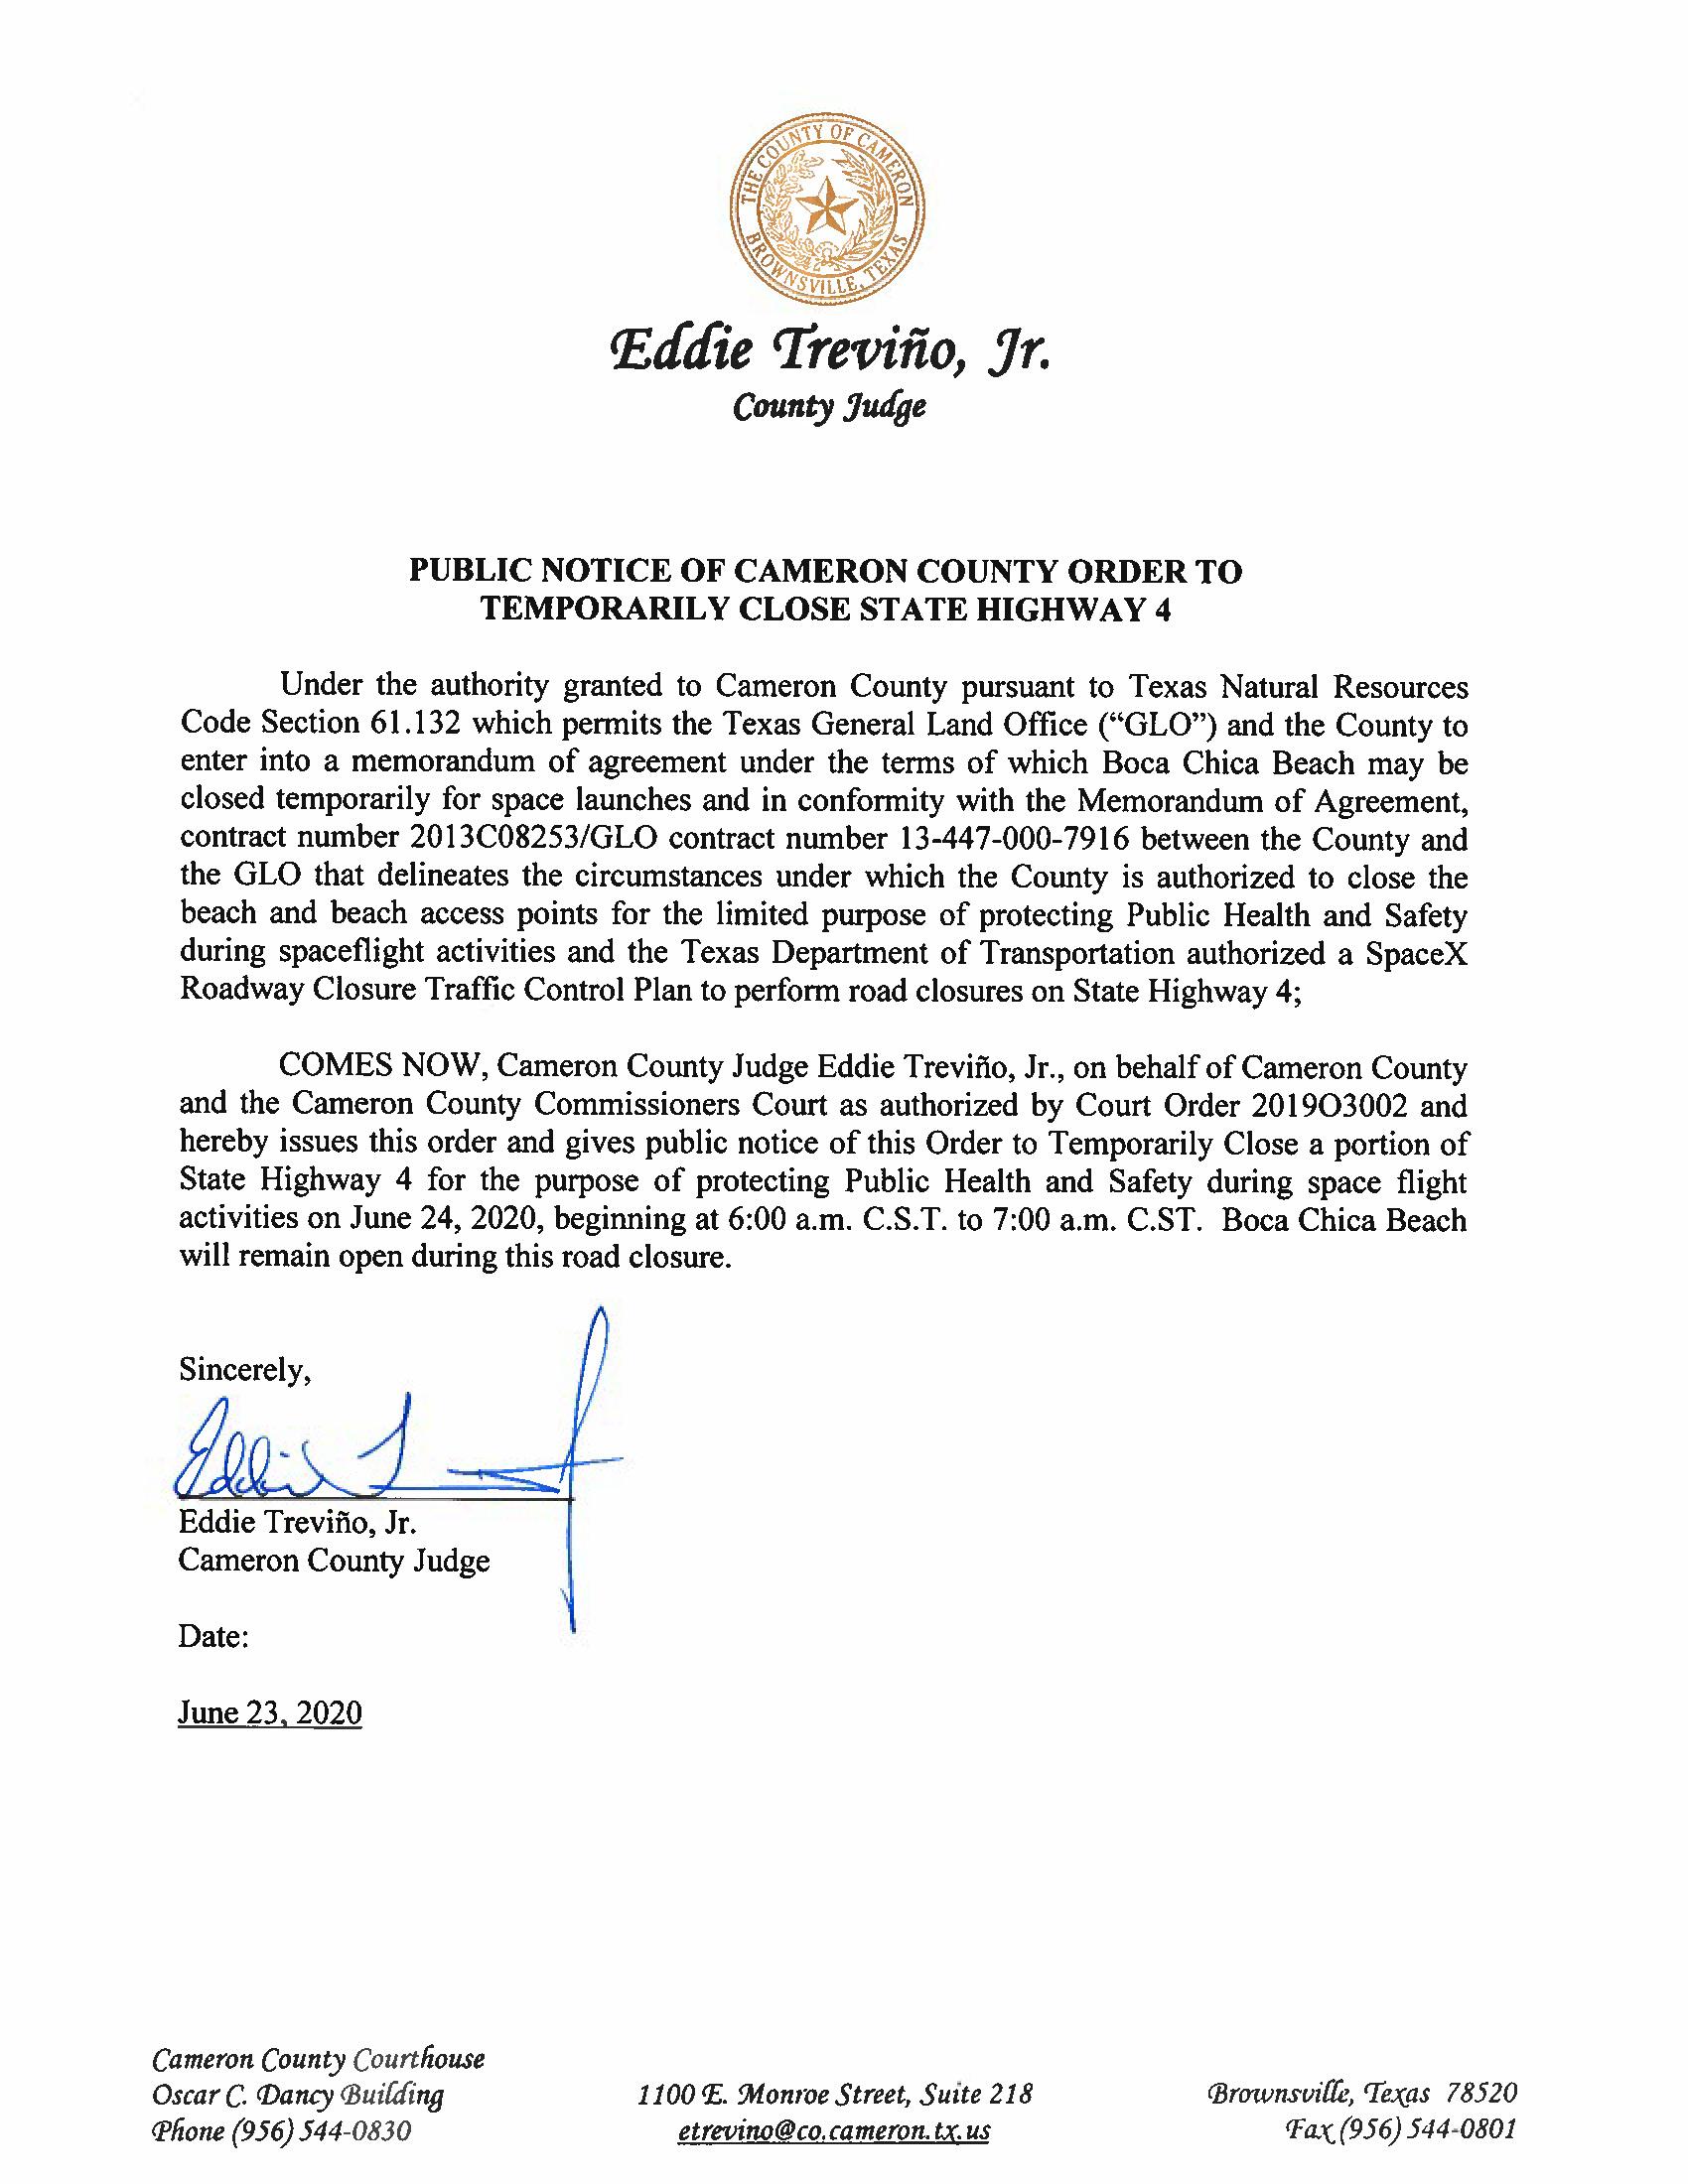 PUBLIC NOTICE OF CAMERON COUNTY ORDER TO TEMP. ROAD CLOSURE. 06.24.20